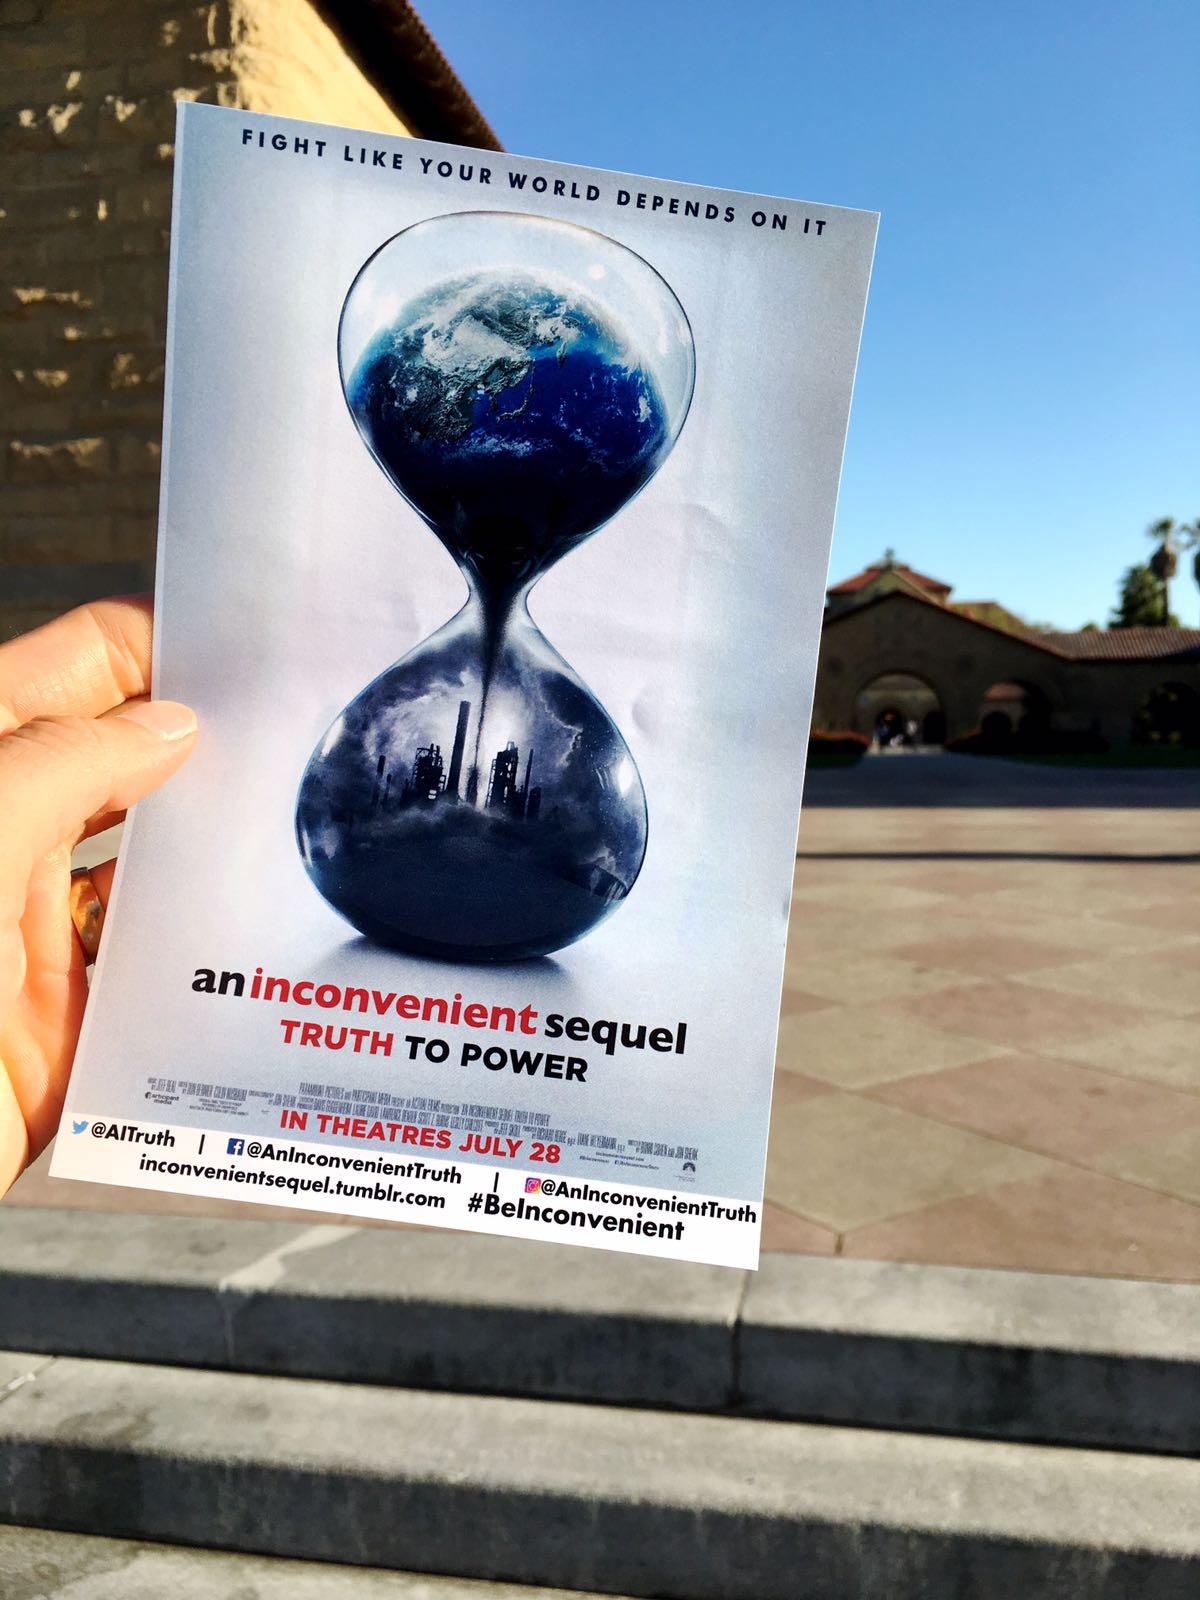 Linn Gustafsson San Francisco Stanford An inconvenientsequal - Truth to power with Al Gore